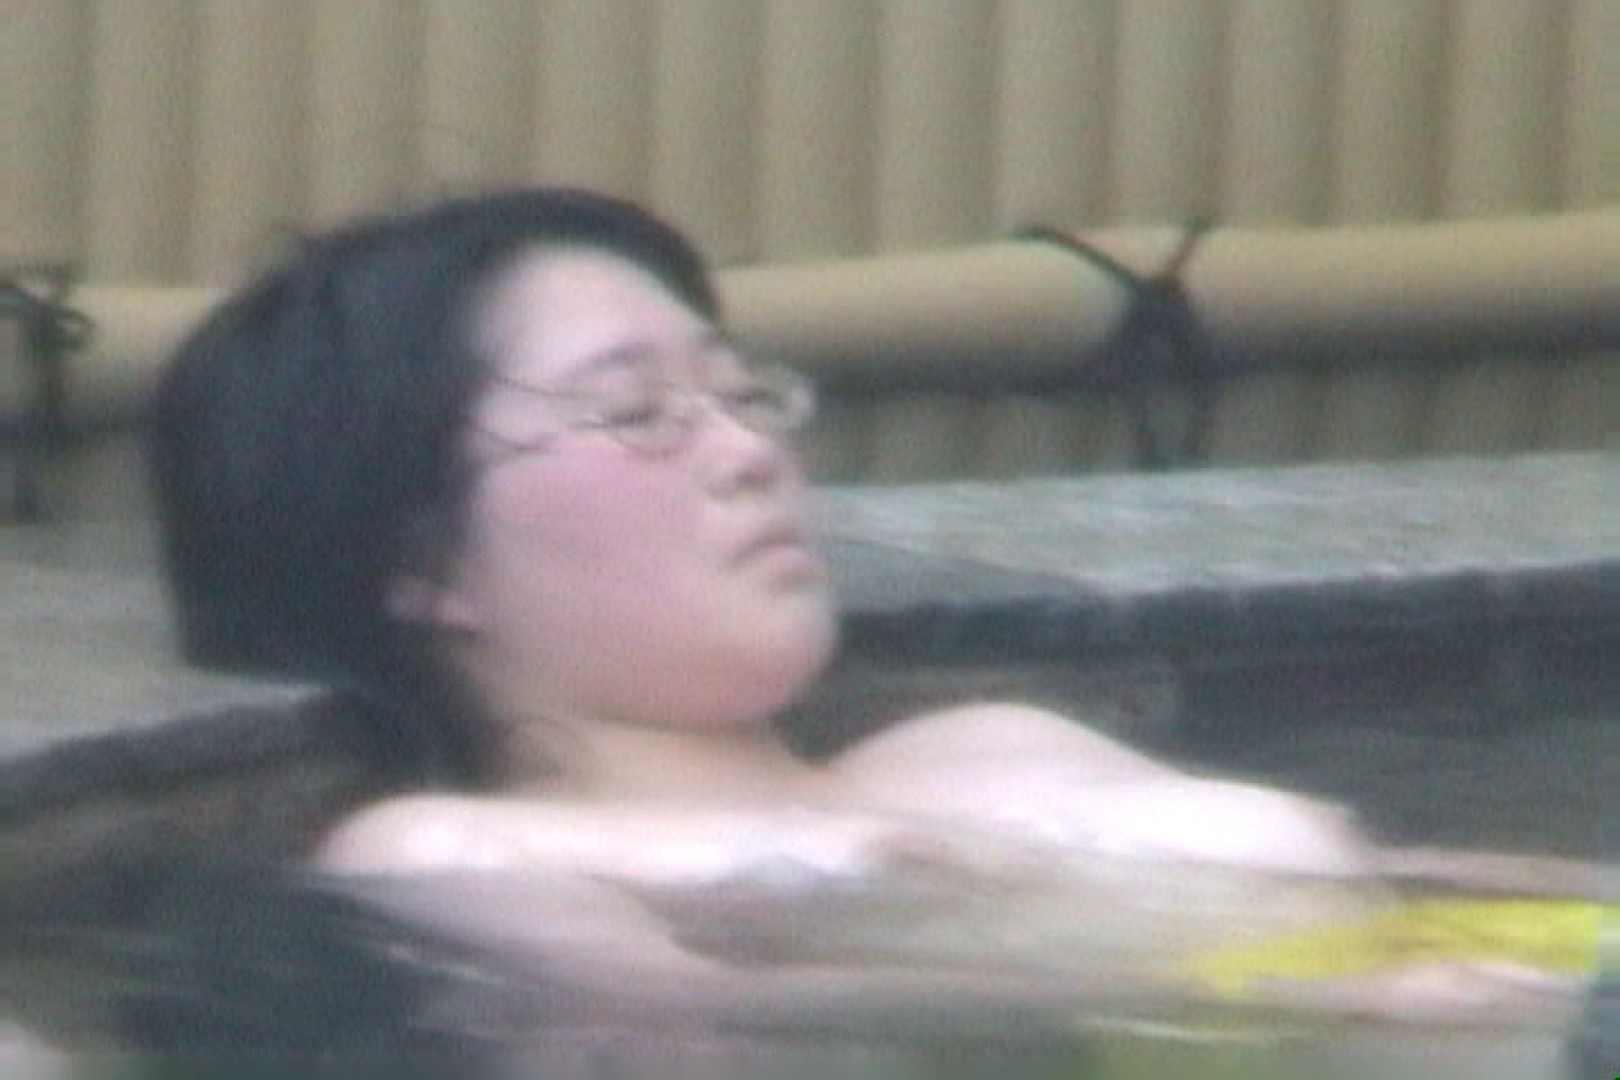 Aquaな露天風呂Vol.46【VIP限定】 HなOL | 露天  90pic 13